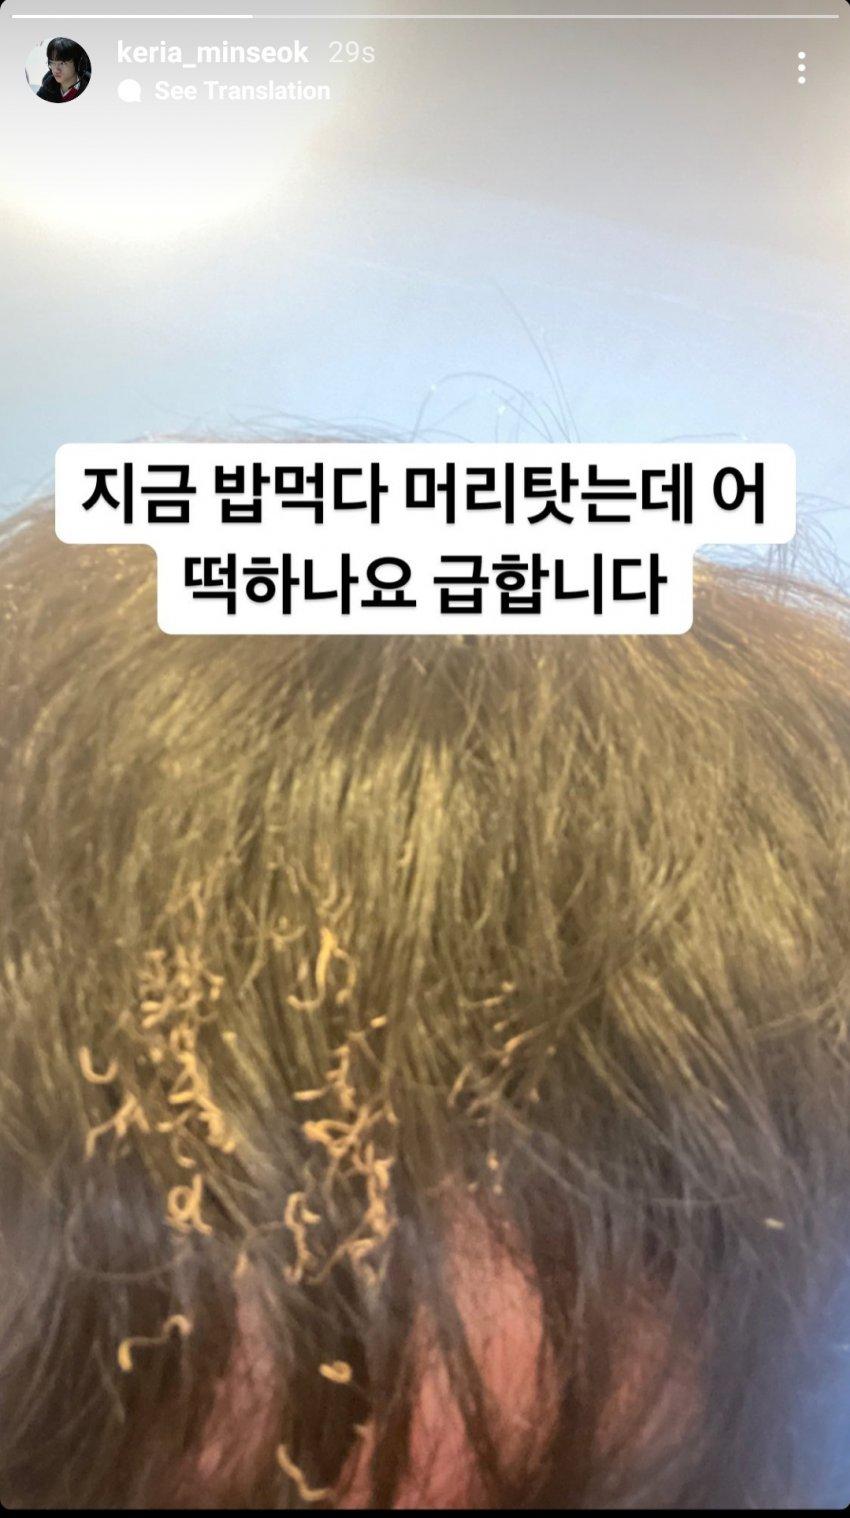 viewimage.php?id=21b8d121f0d737a062bad1b018d53769&no=24b0d769e1d32ca73ceb86fa11d02831eebc6c37c2fa034916fac403212205e6466acfbc28dfa1dc919a8c896033d0eeb35c27e38f2d2803e51fe42172ec6e74061e81a7176f3917587d2f4e1c8a920f4391066029e15ad277a2cca9ff41